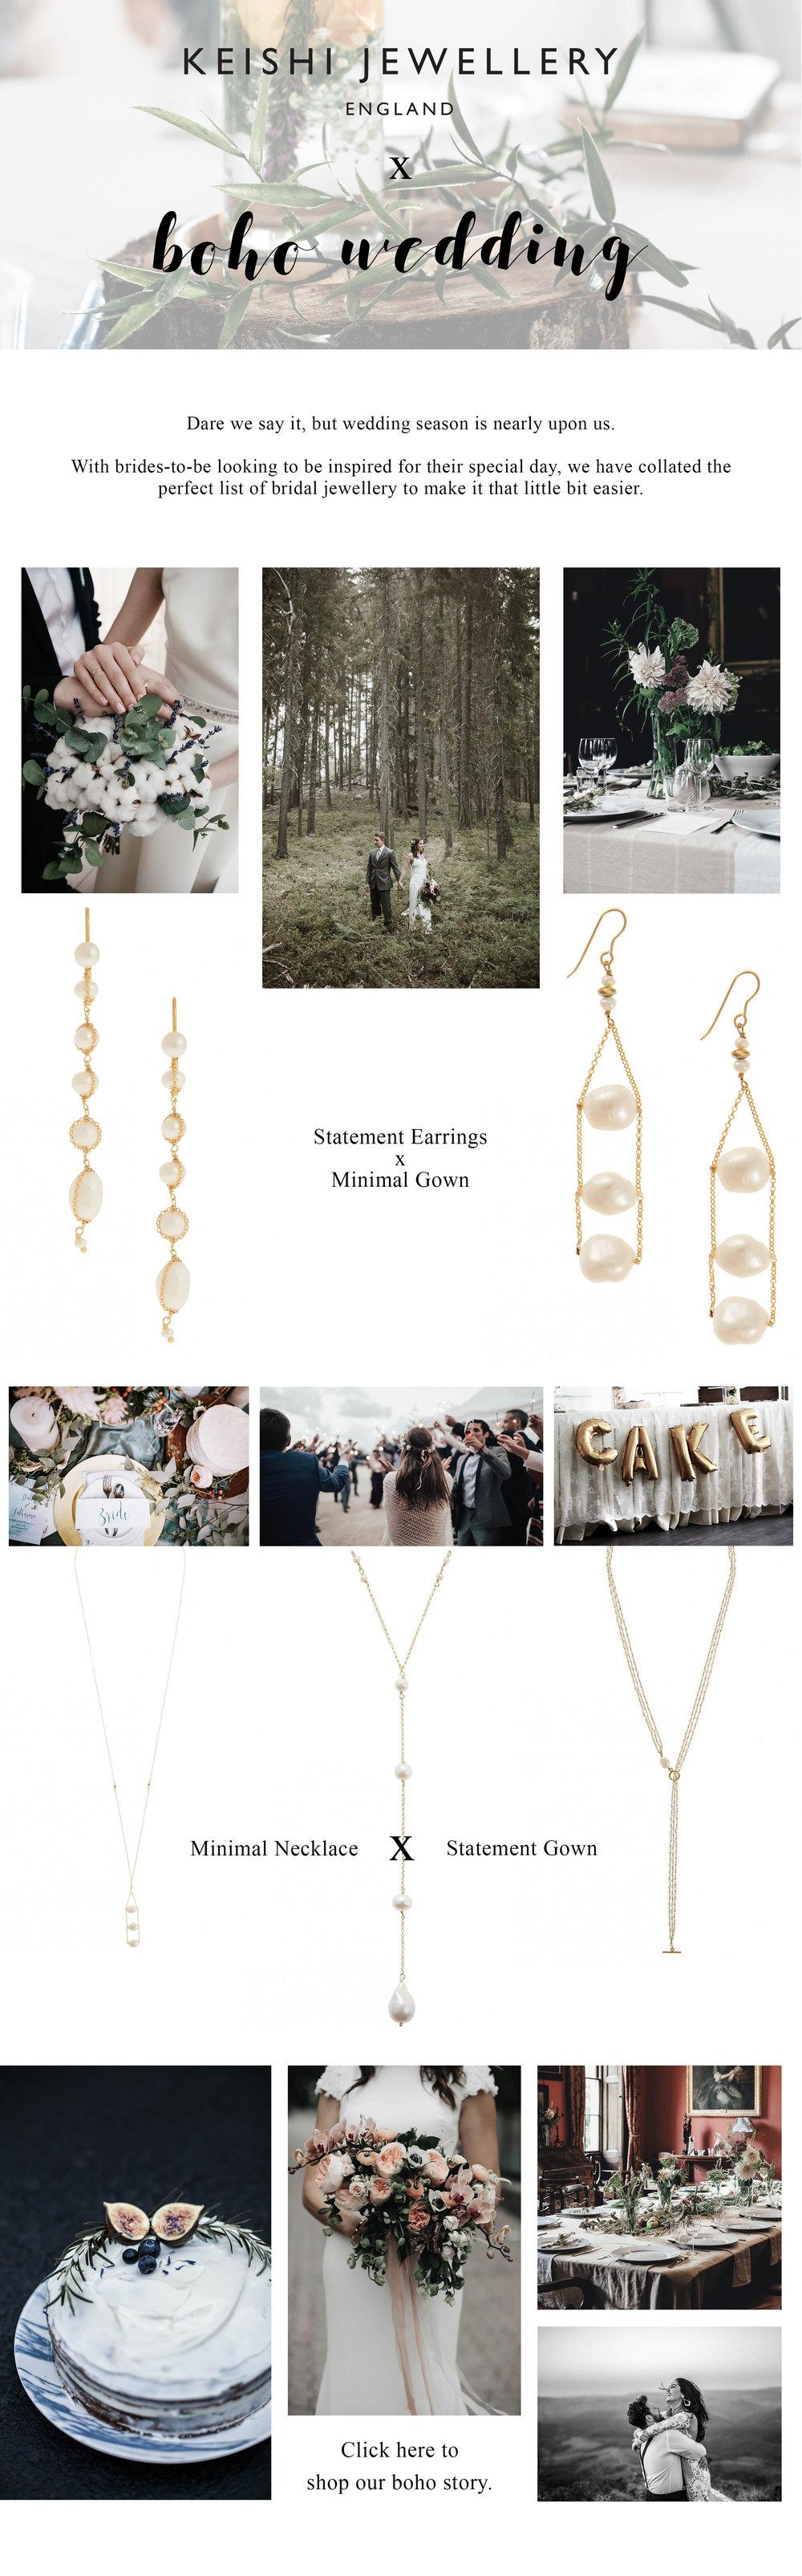 Keishi Jewellery x Boho Wedding.jpg